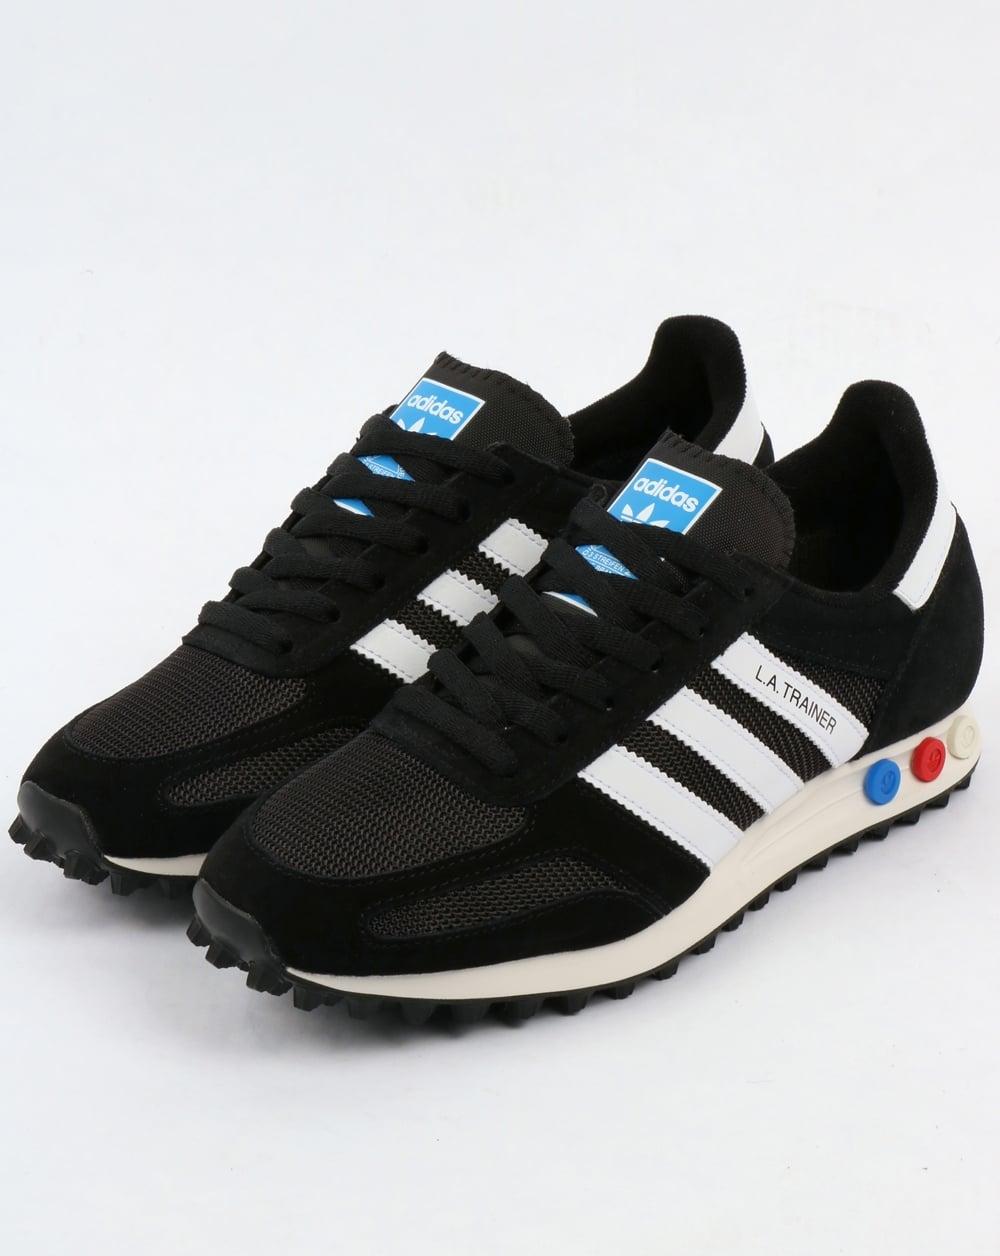 Adidas LA Trainer OG Black/White,shoes